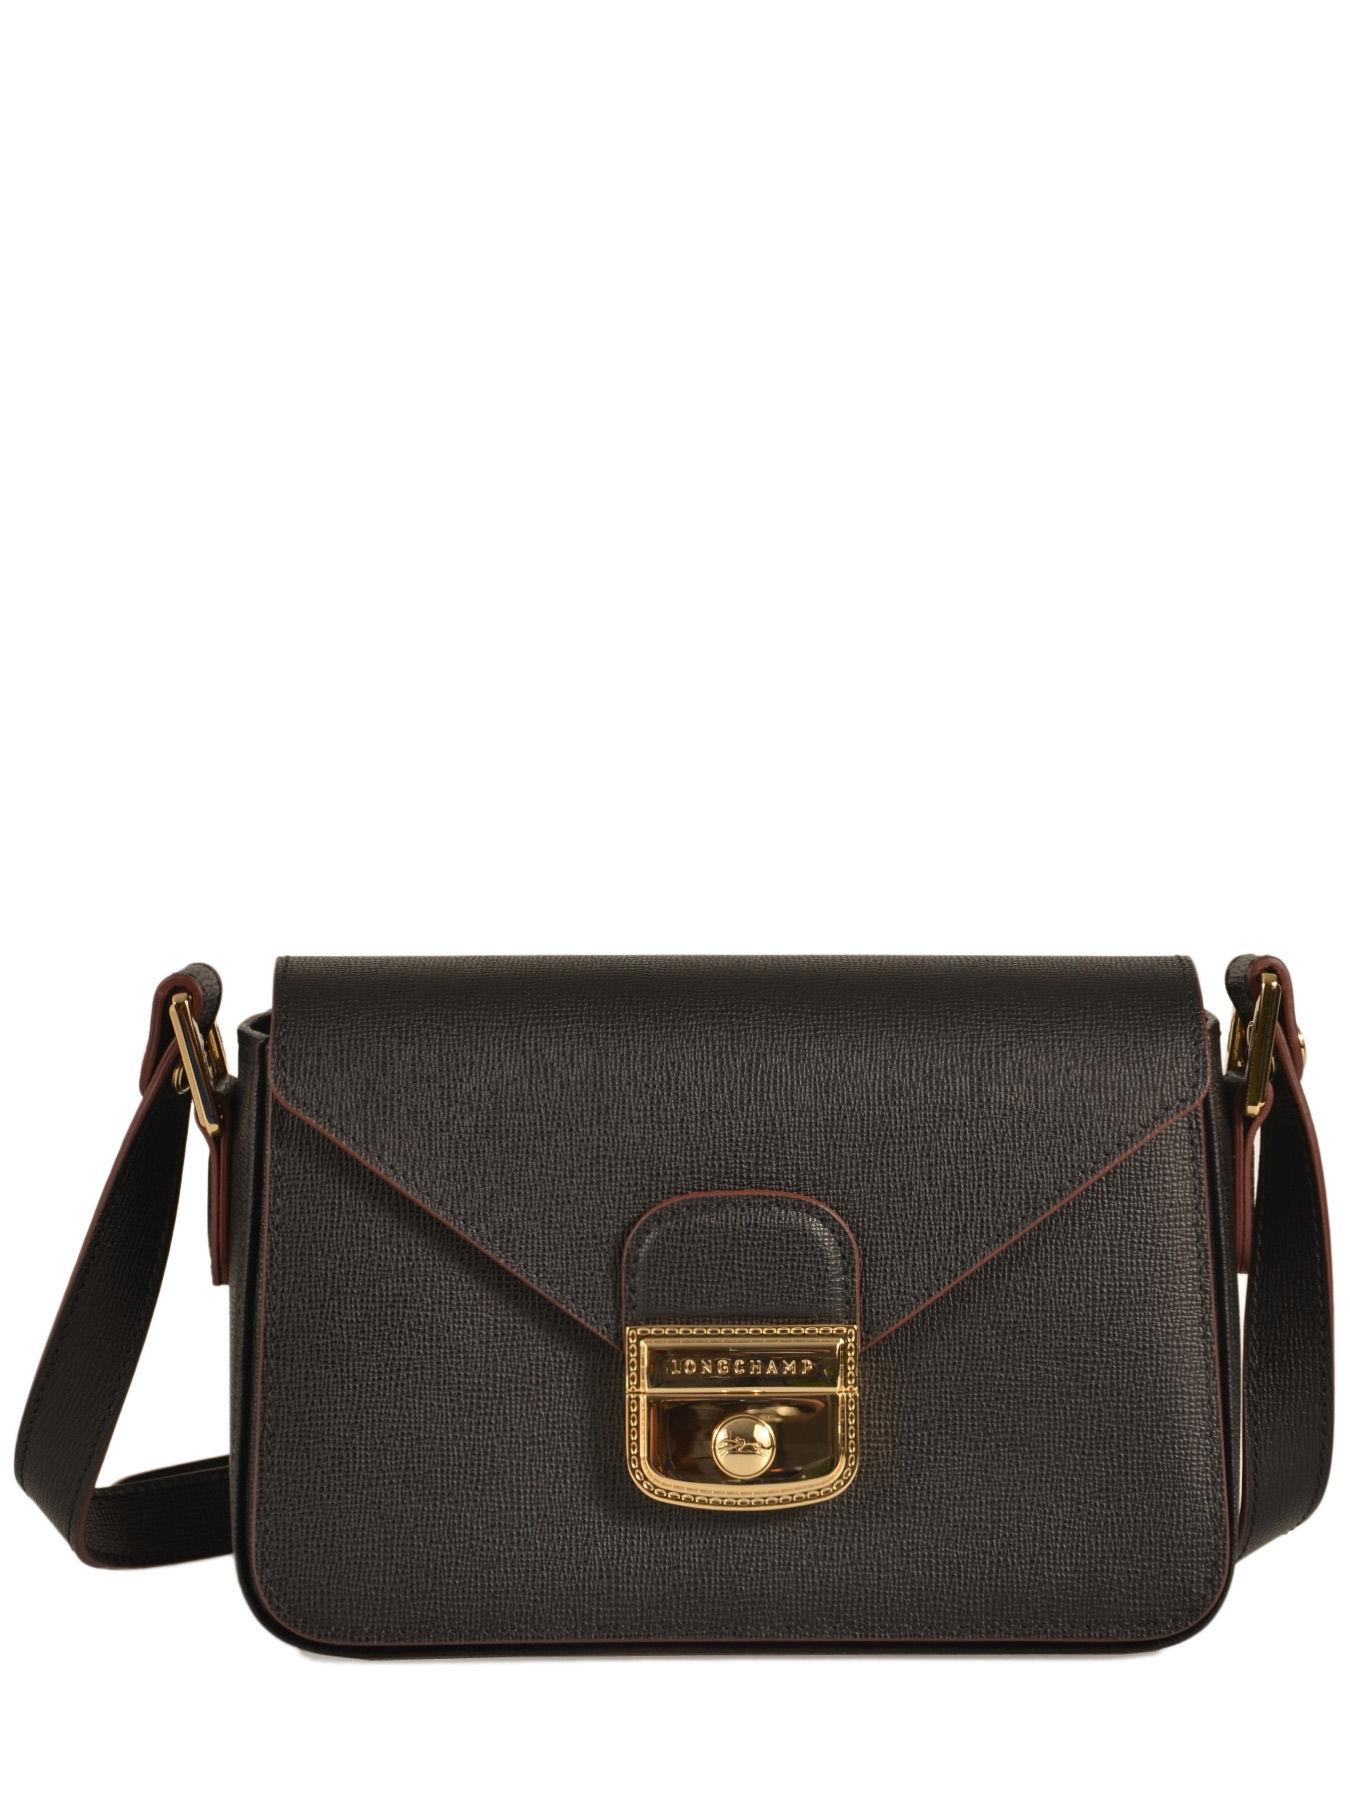 Sac Longchamp Noir Le Pliage : Sac port travers longchamp le pliage heritage noir en